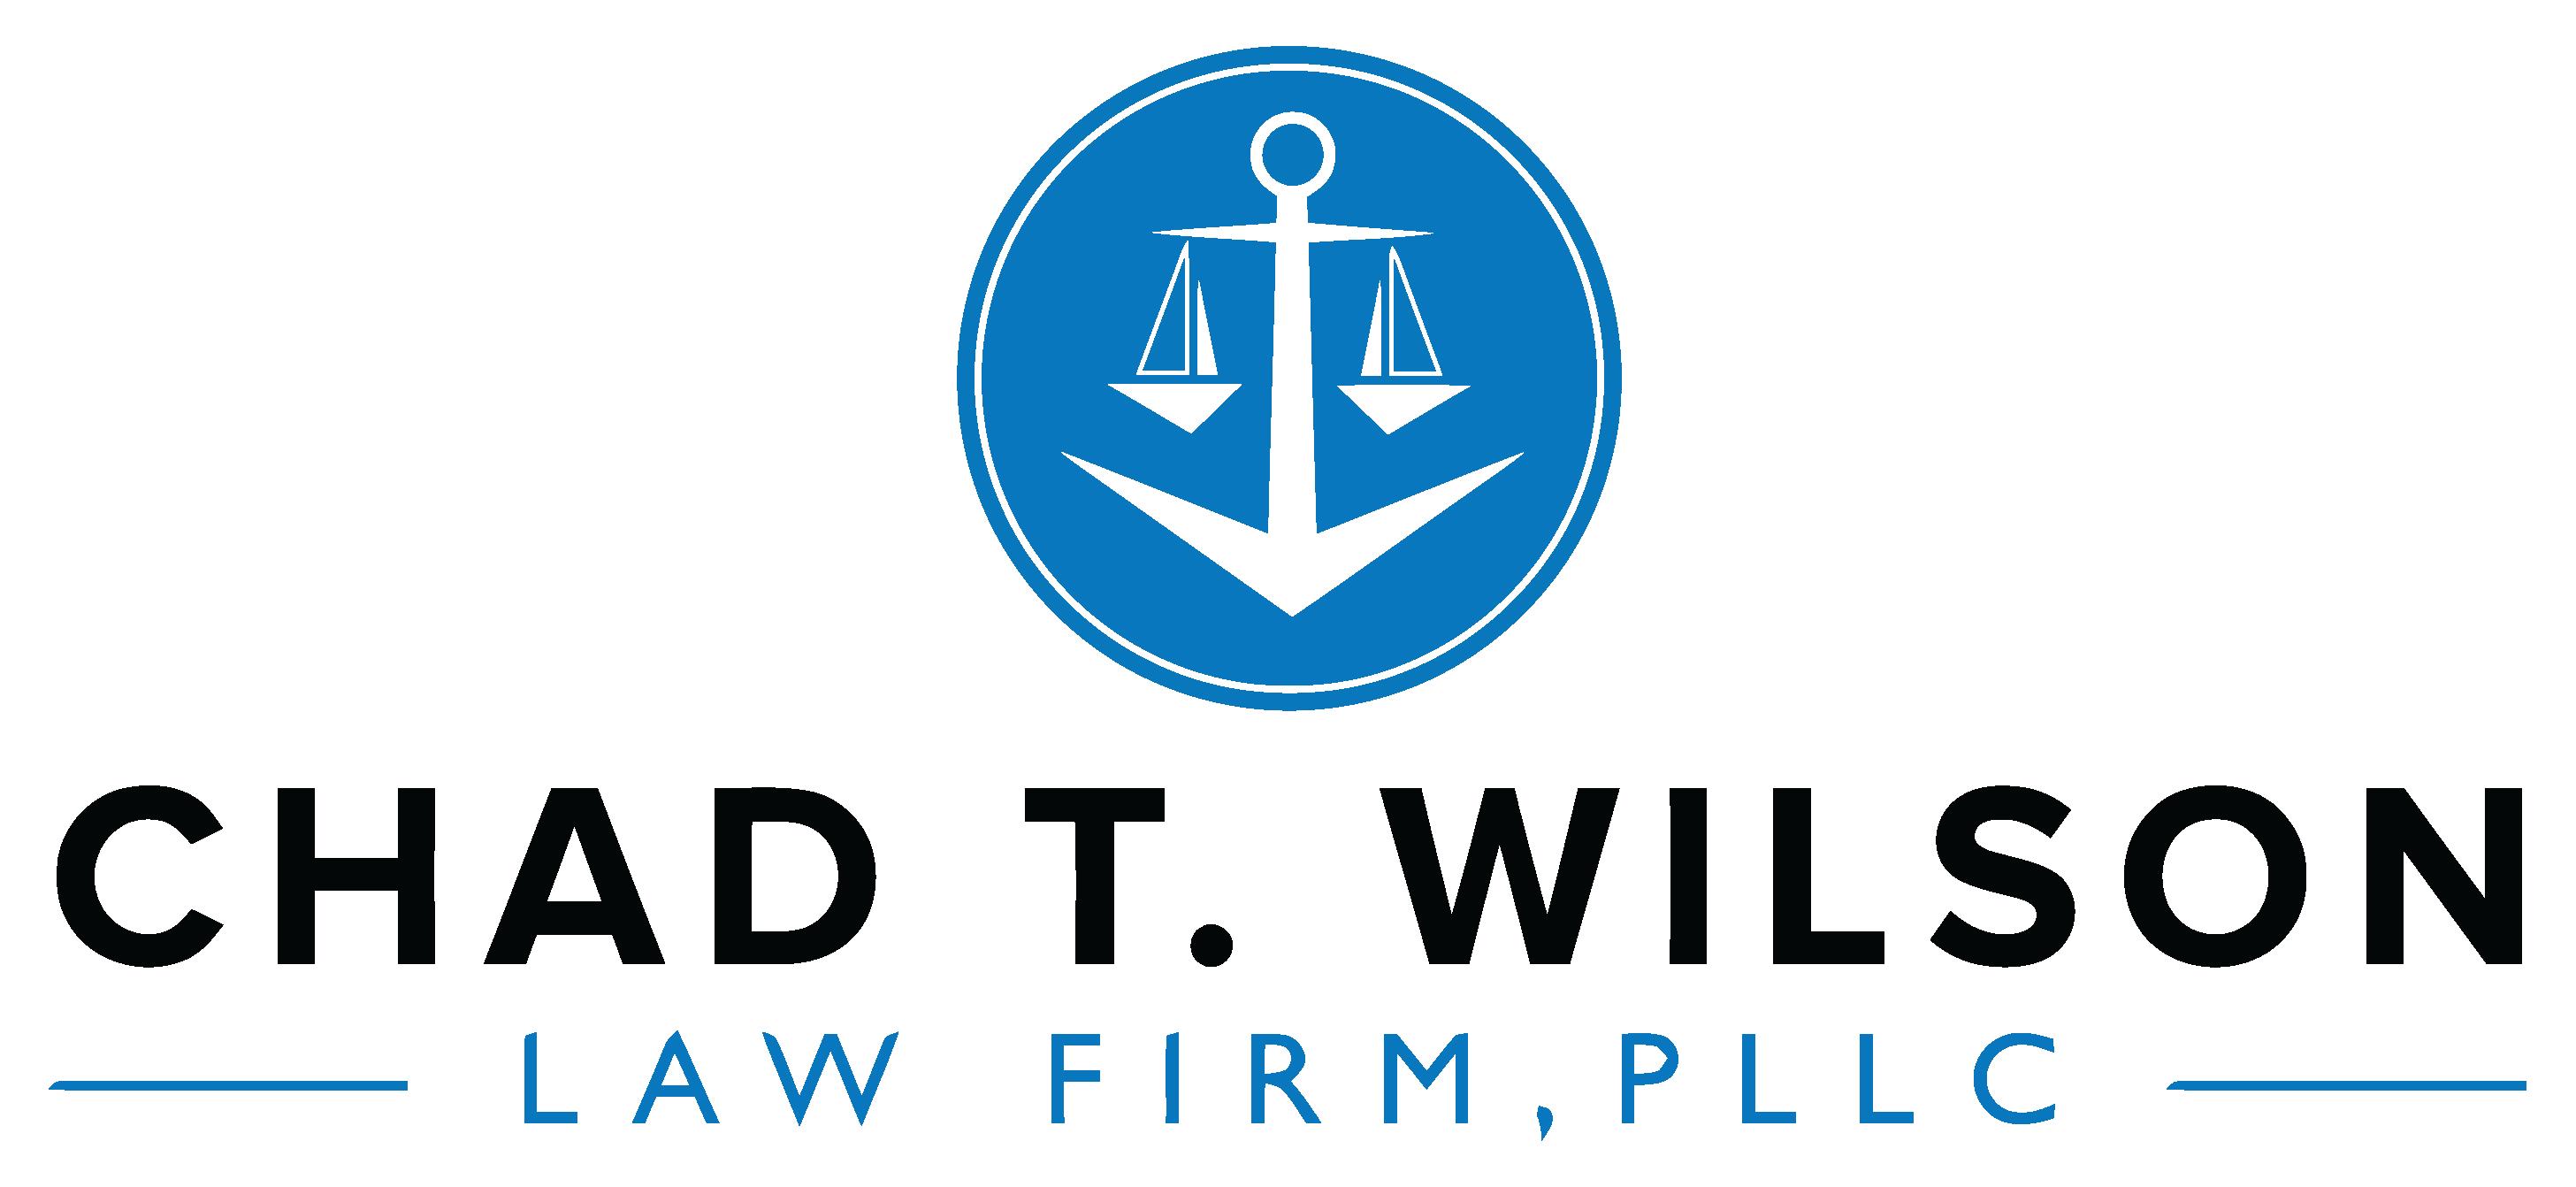 Chad T. Wilson Law Firm Logo